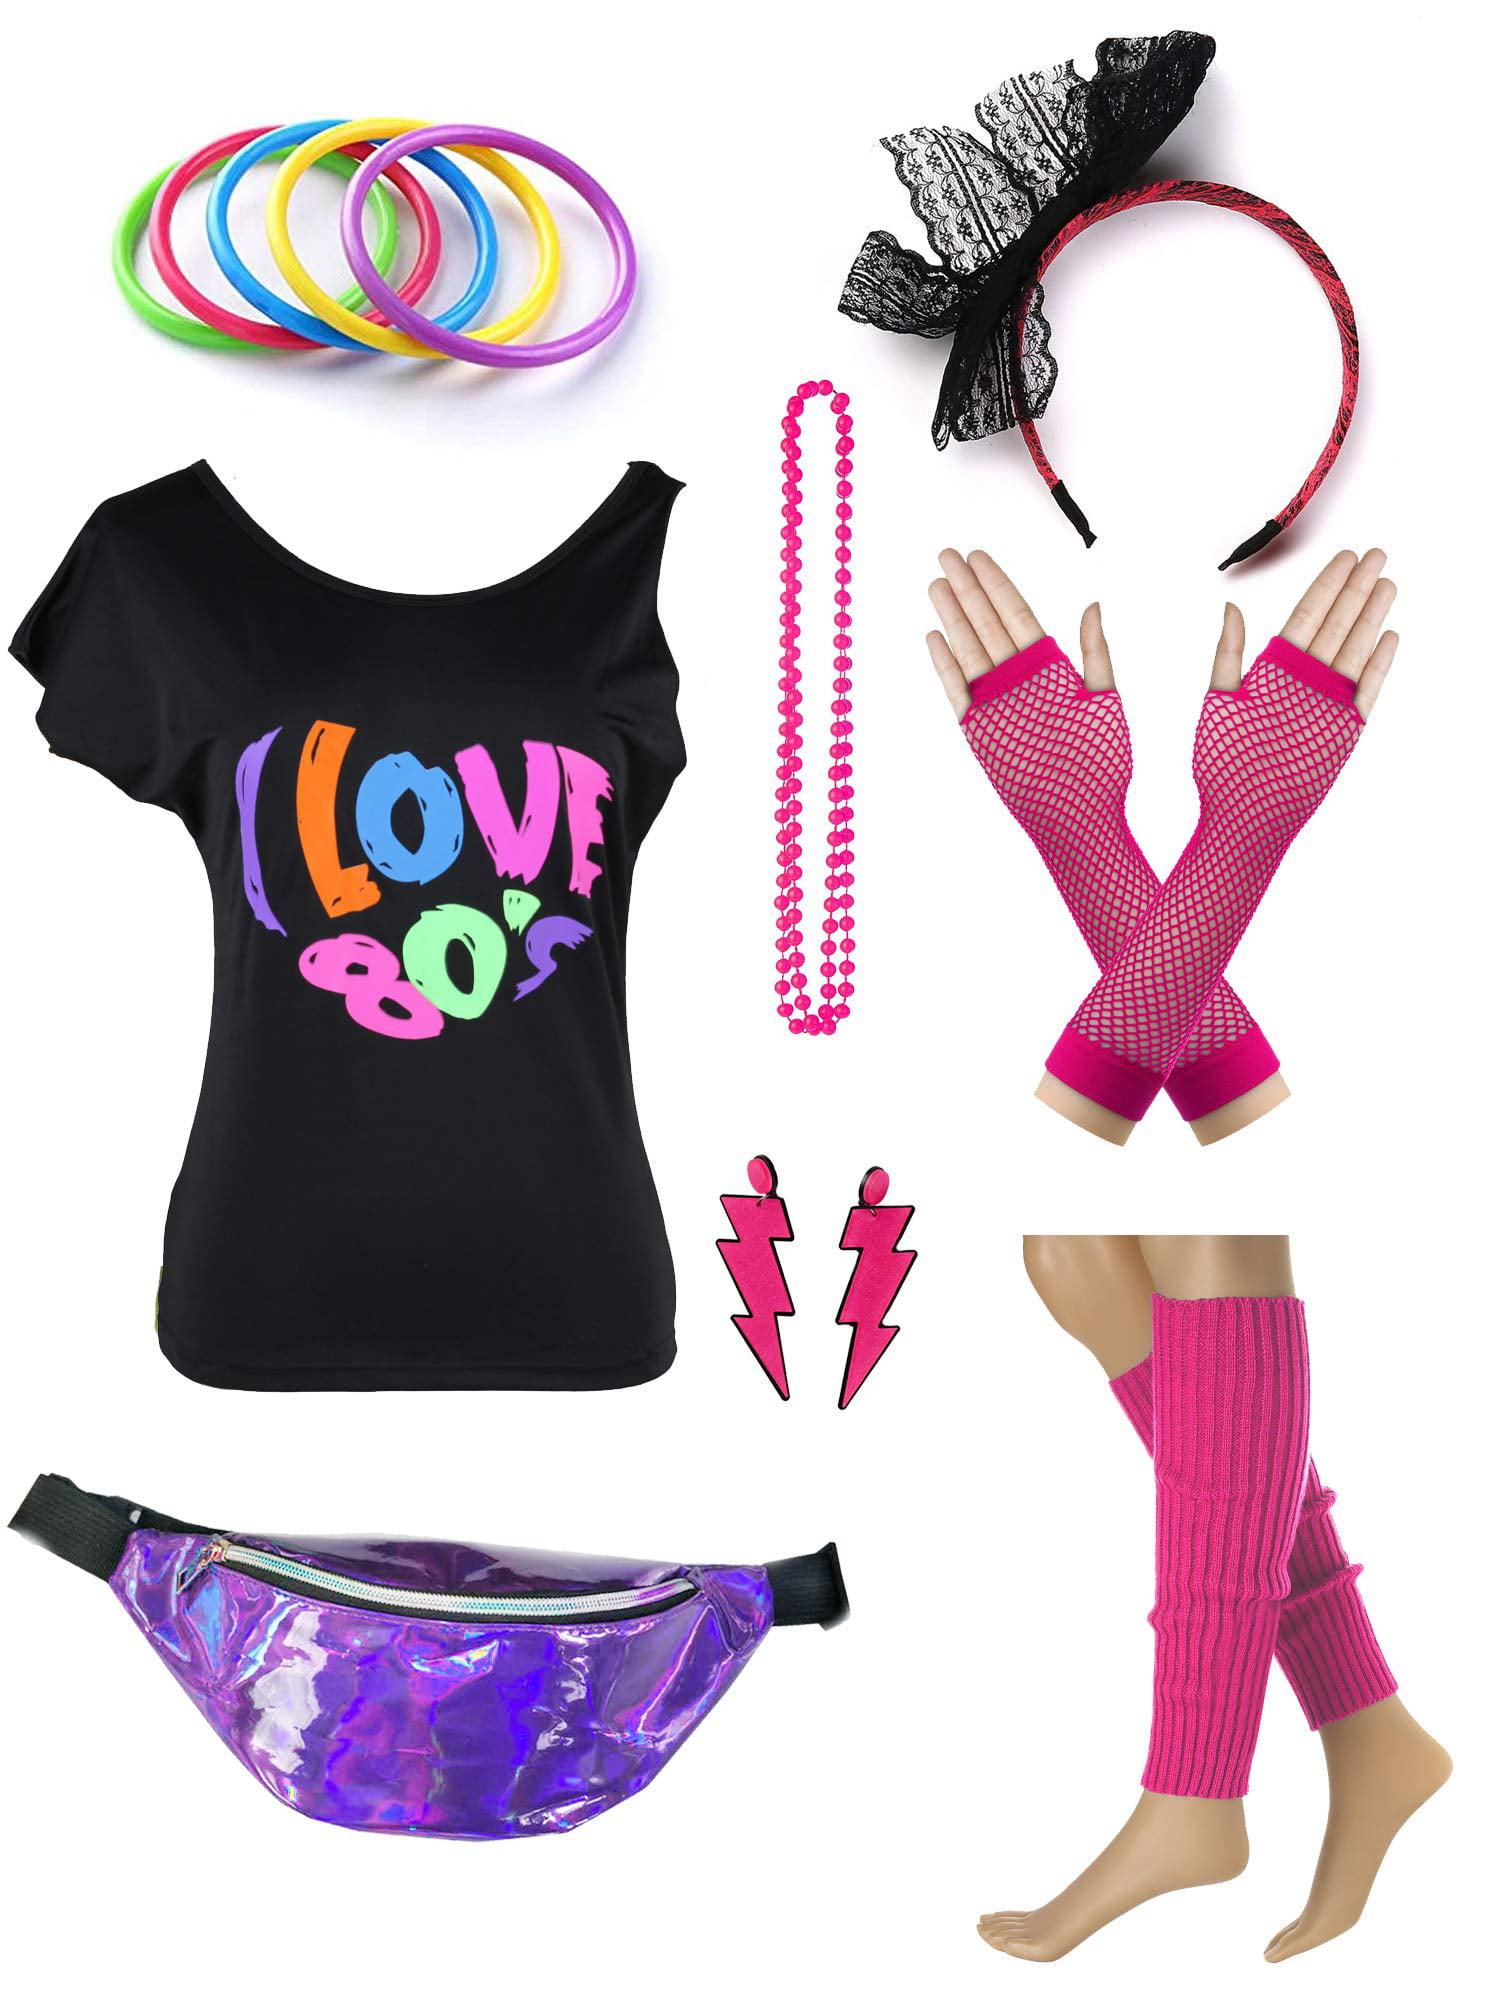 Fancy Dress Neon Plastic Beads Hot Pink Necklace 70/'s /& 80/'s Pop Art Accessory